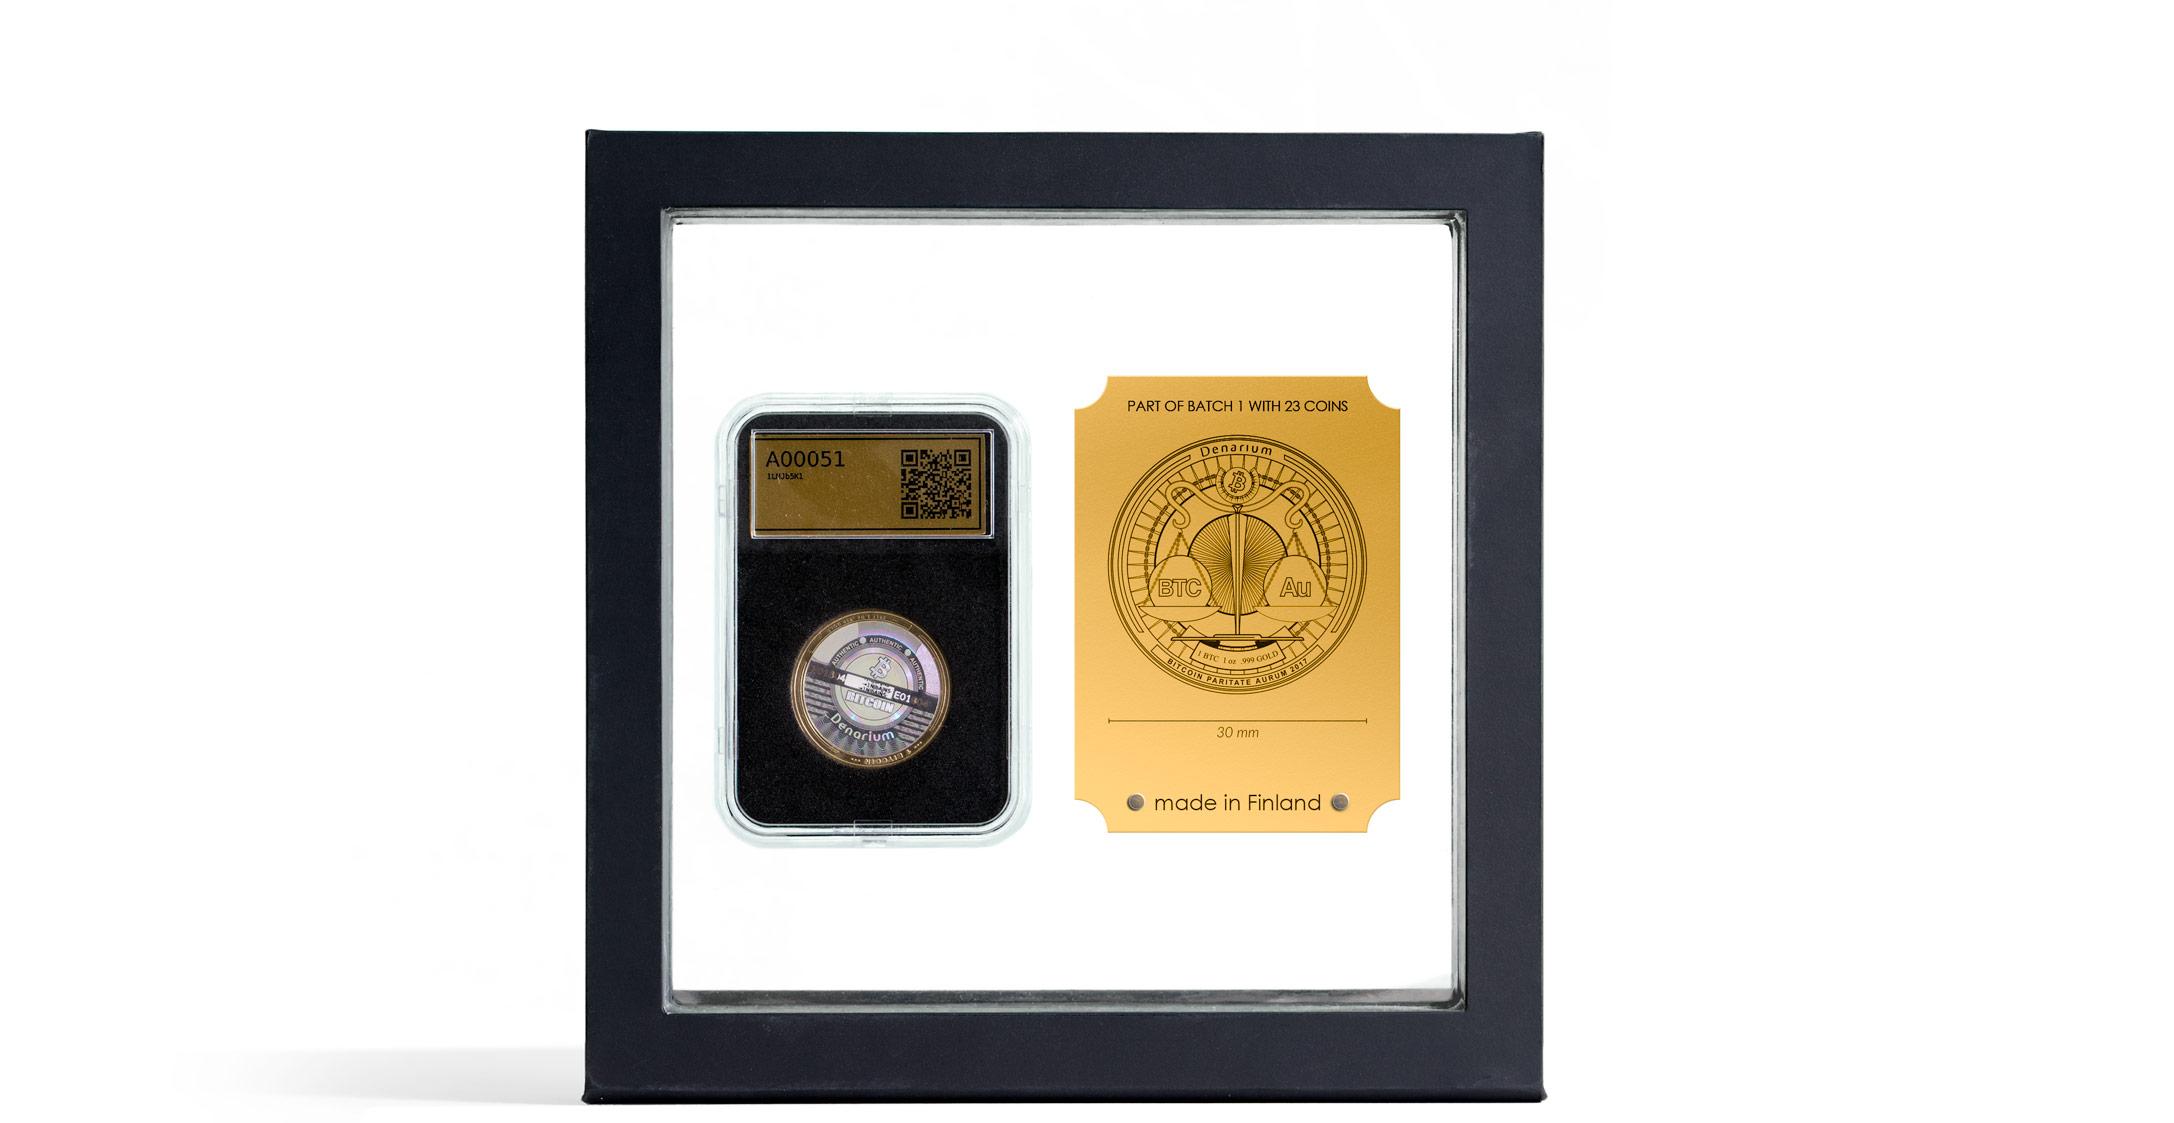 gold coin,.999 gold, proof quality, pure, hologram, bitcoin wallet, physical bitcoins, denarium, slab case,